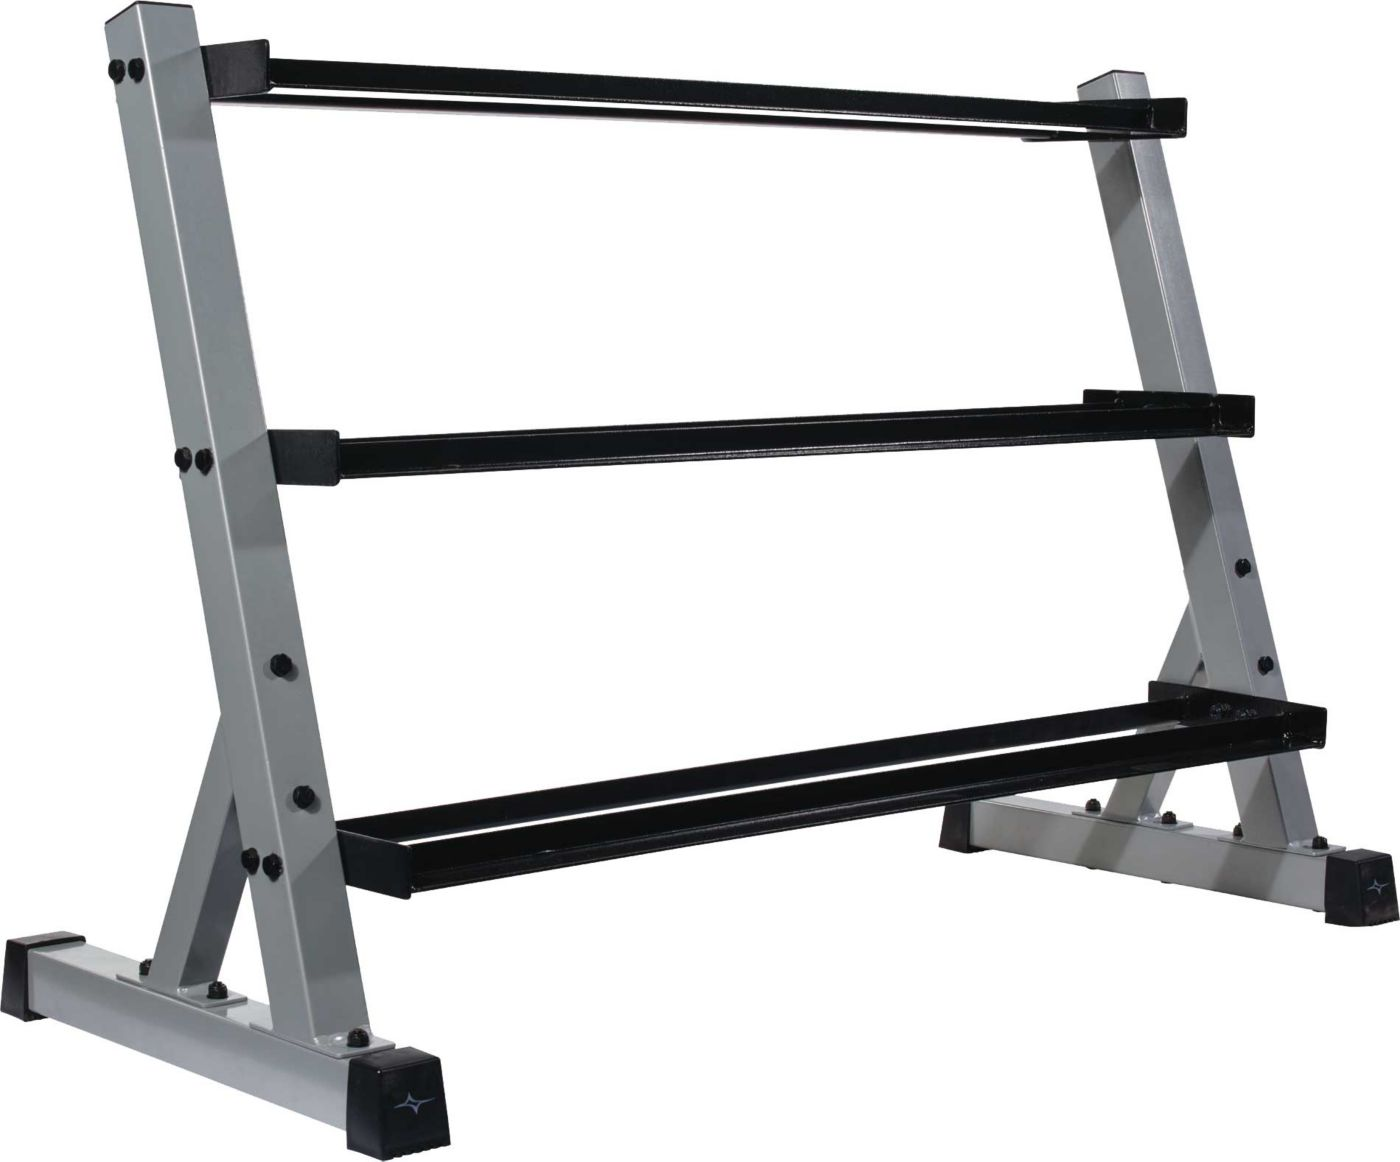 Fitness Gear Pro 3-Tier Storage Rack